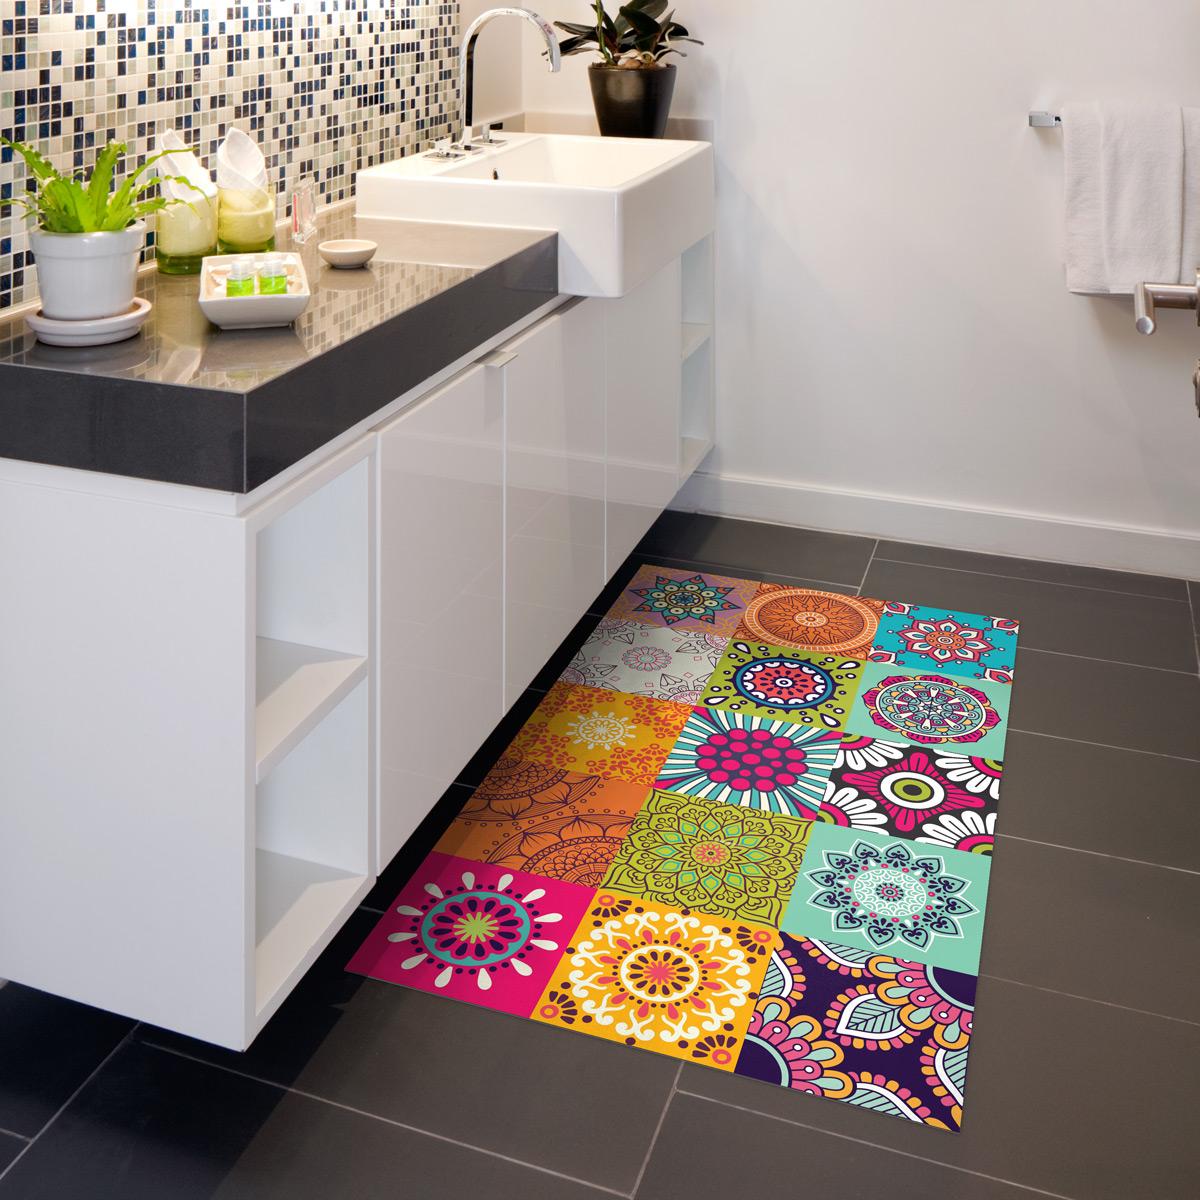 tapis vinyle carrelages azteka 60 x 100 cm stickers art et design artistiques ambiance sticker. Black Bedroom Furniture Sets. Home Design Ideas